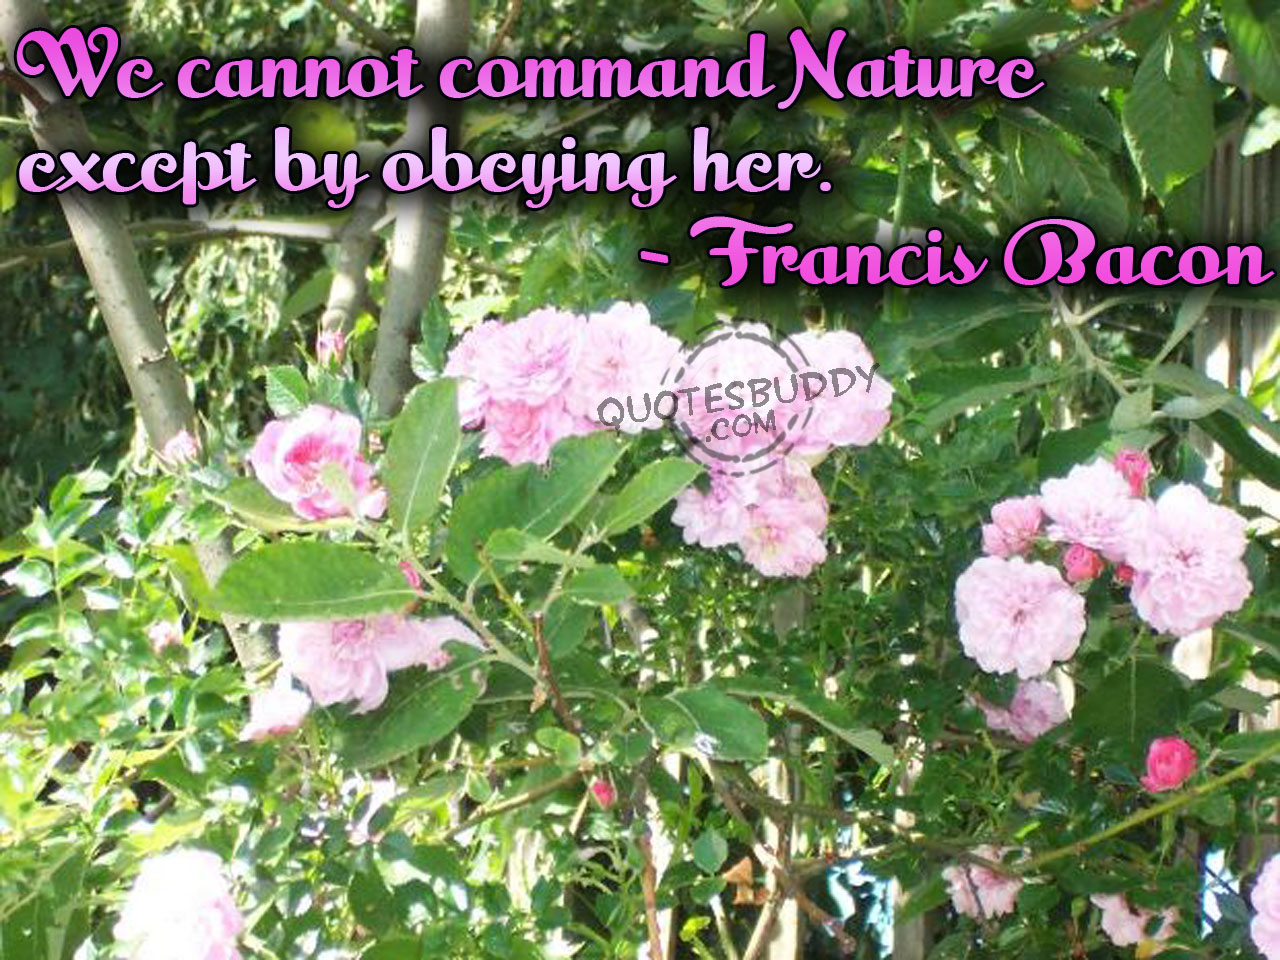 Environmental quote #7